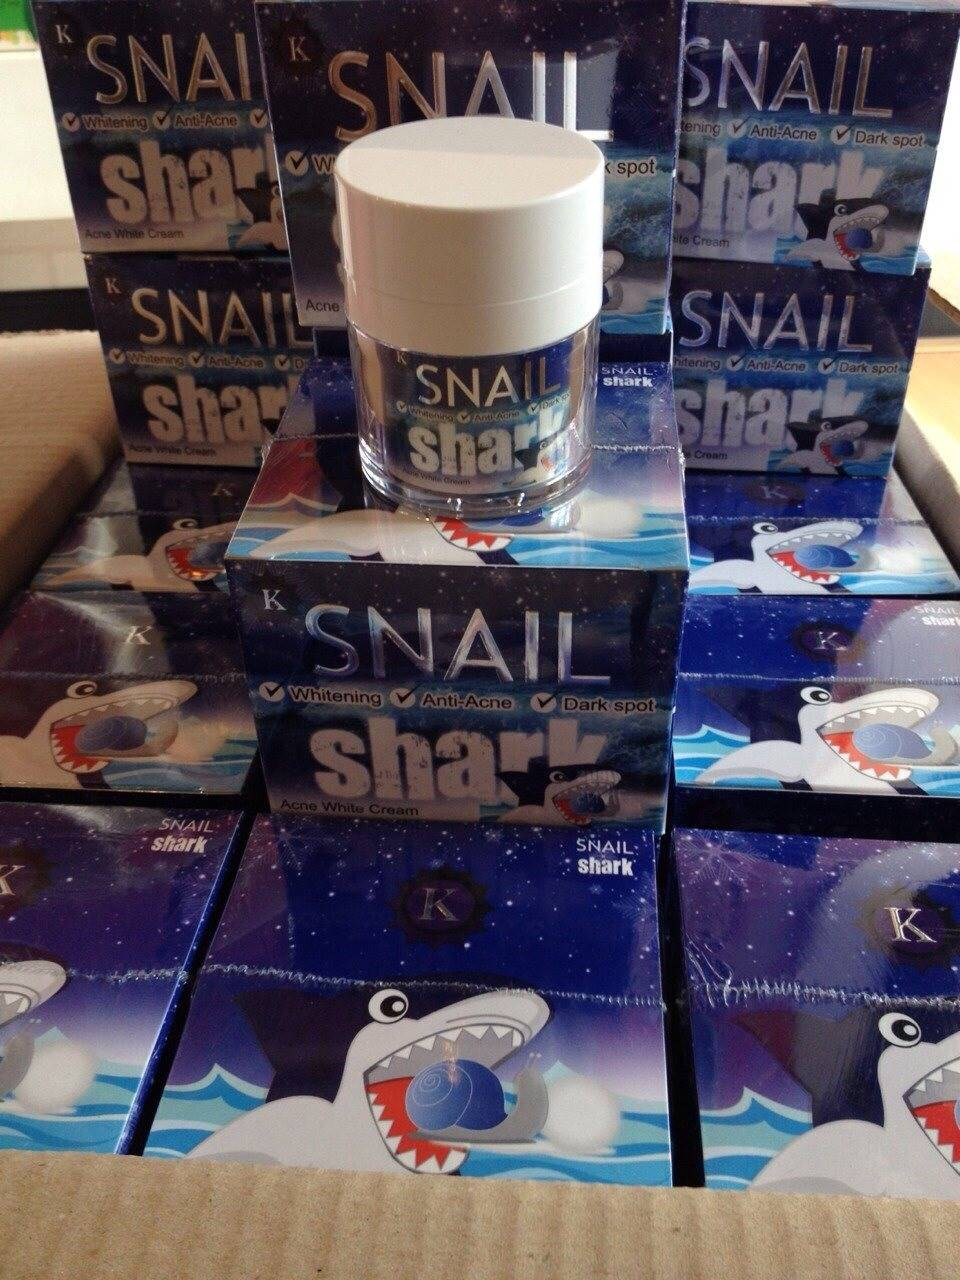 Snail Shark ครีมสเนล ชาร์ค 30 กรัม